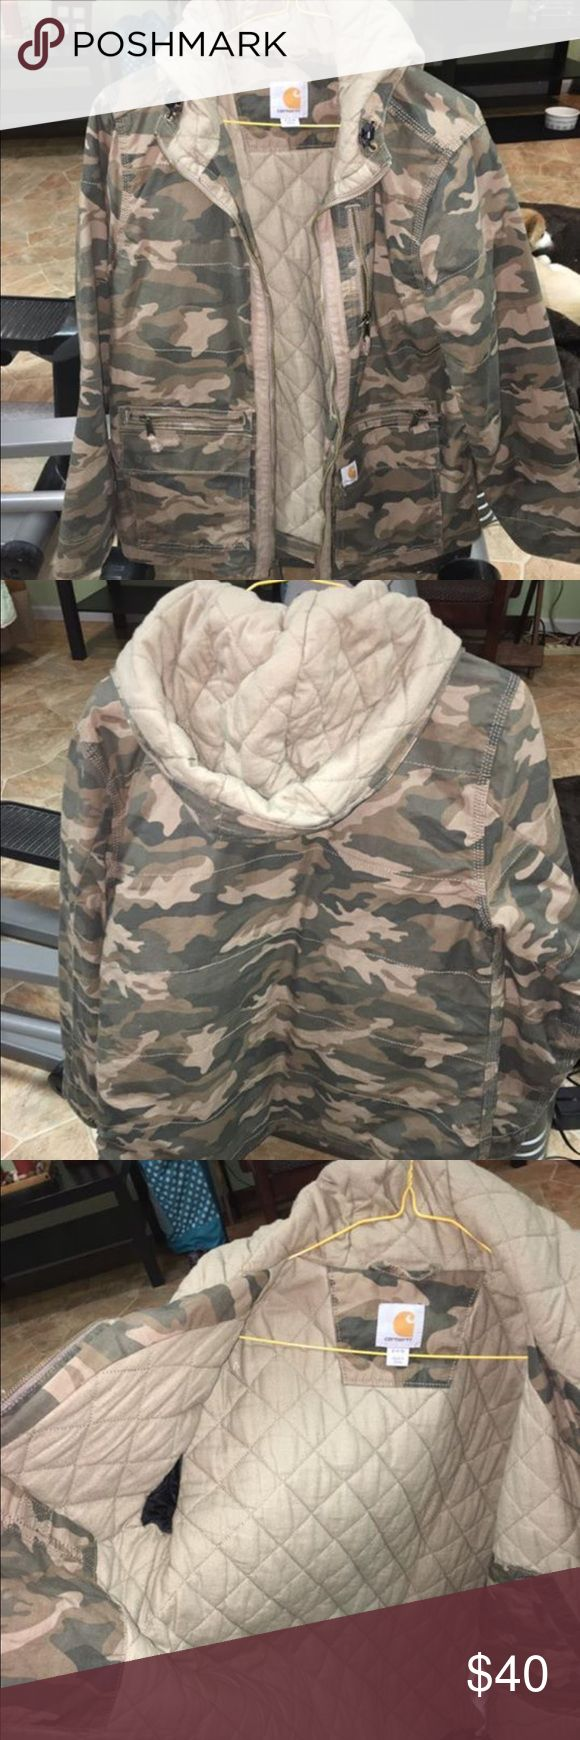 Carhartt women's winter jacket Worn only a few times. Warm!  No flaws, stains, rips. Carhartt Jackets & Coats